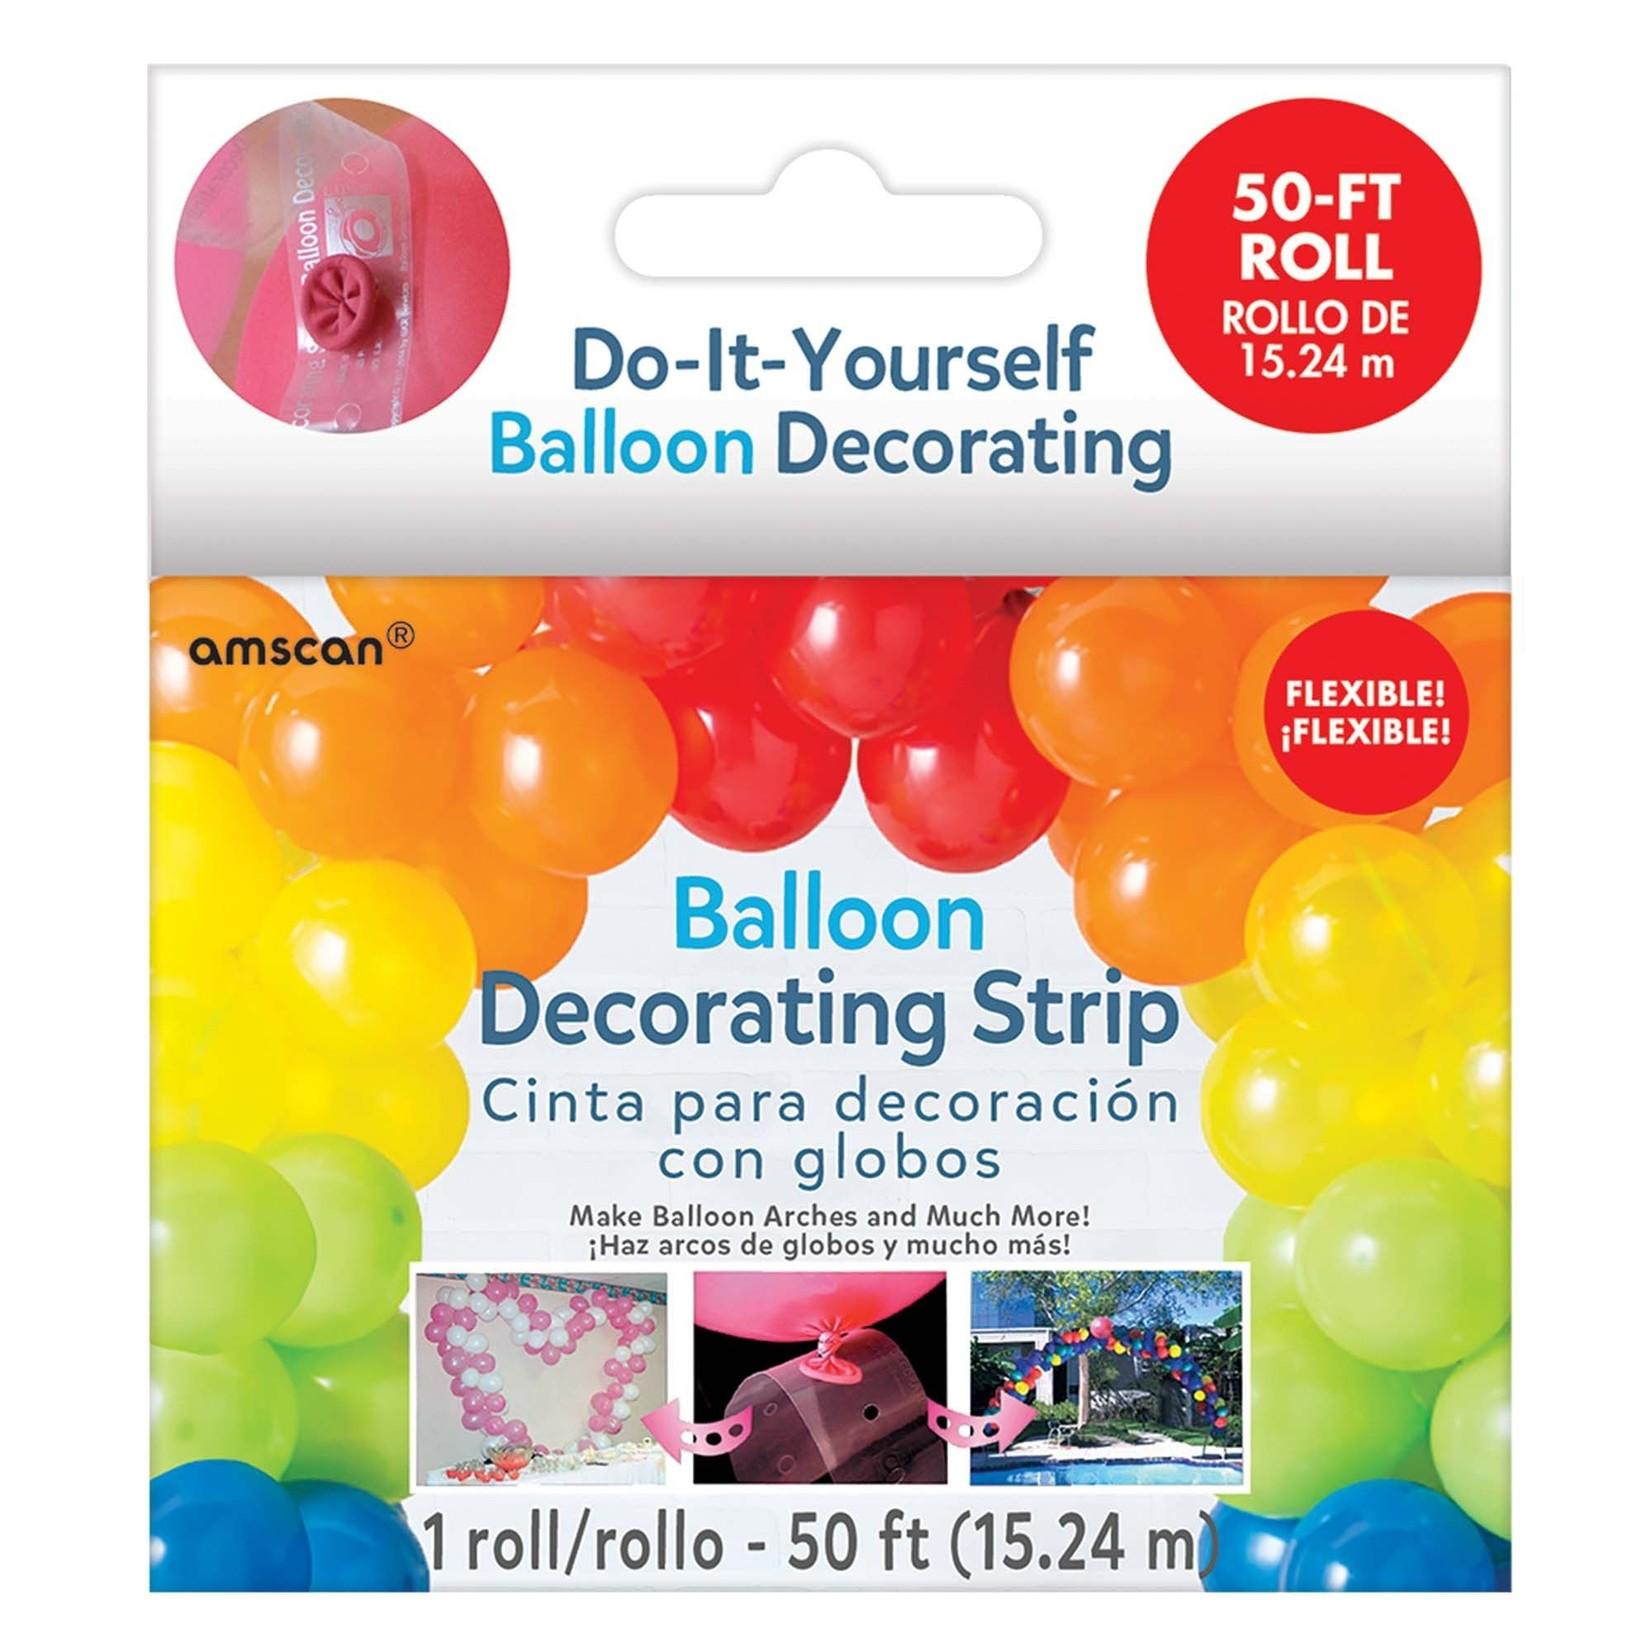 Balloon Decorating Strip